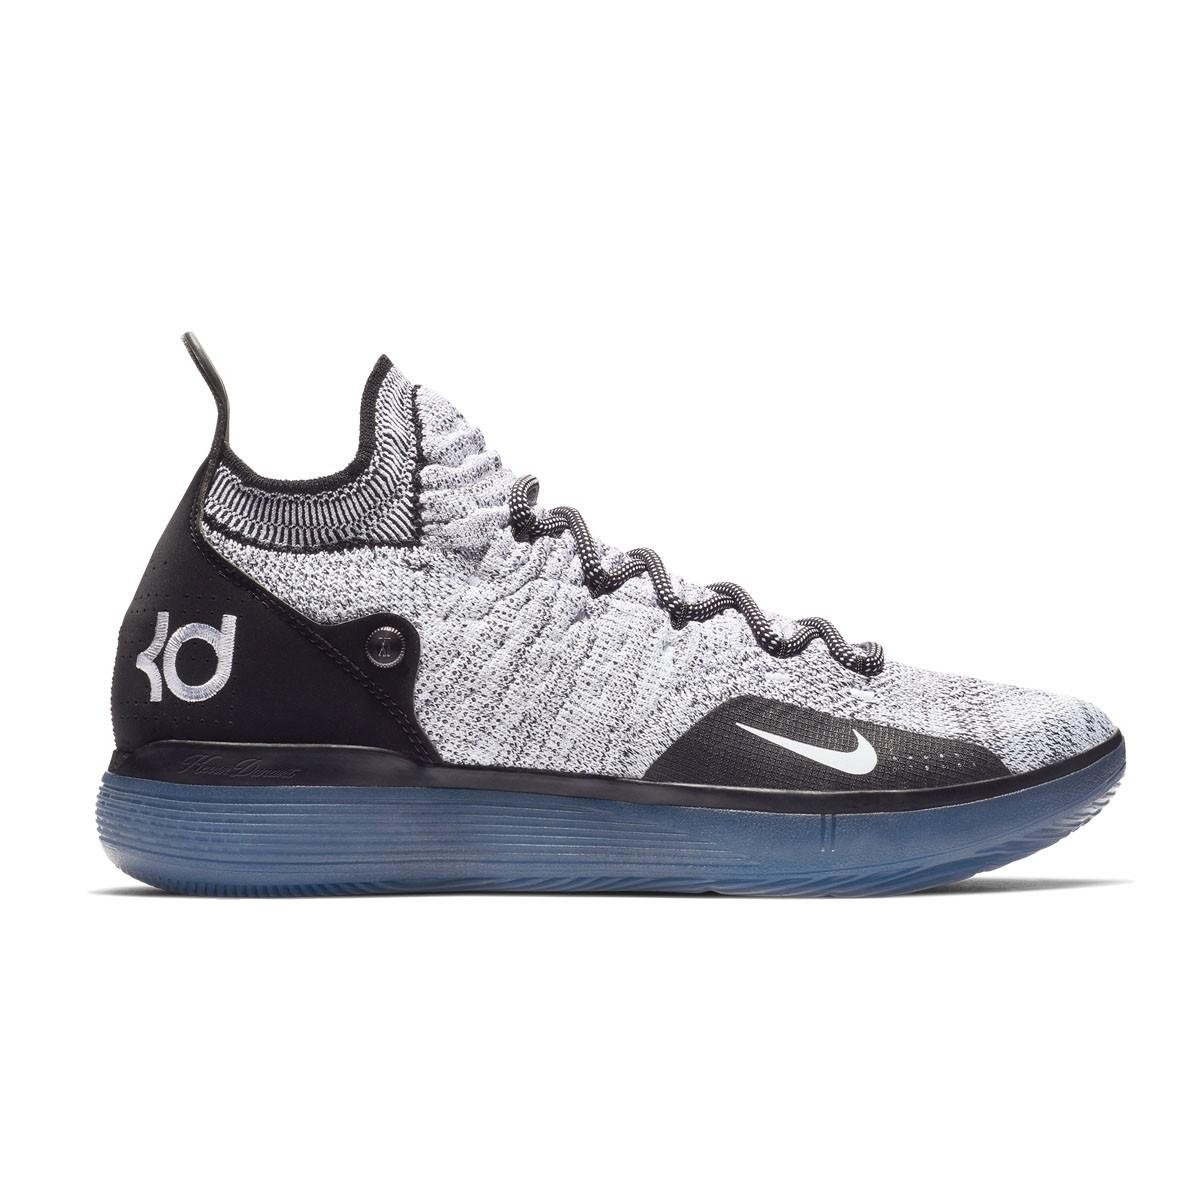 Nike KD 11 'Racer Blue'